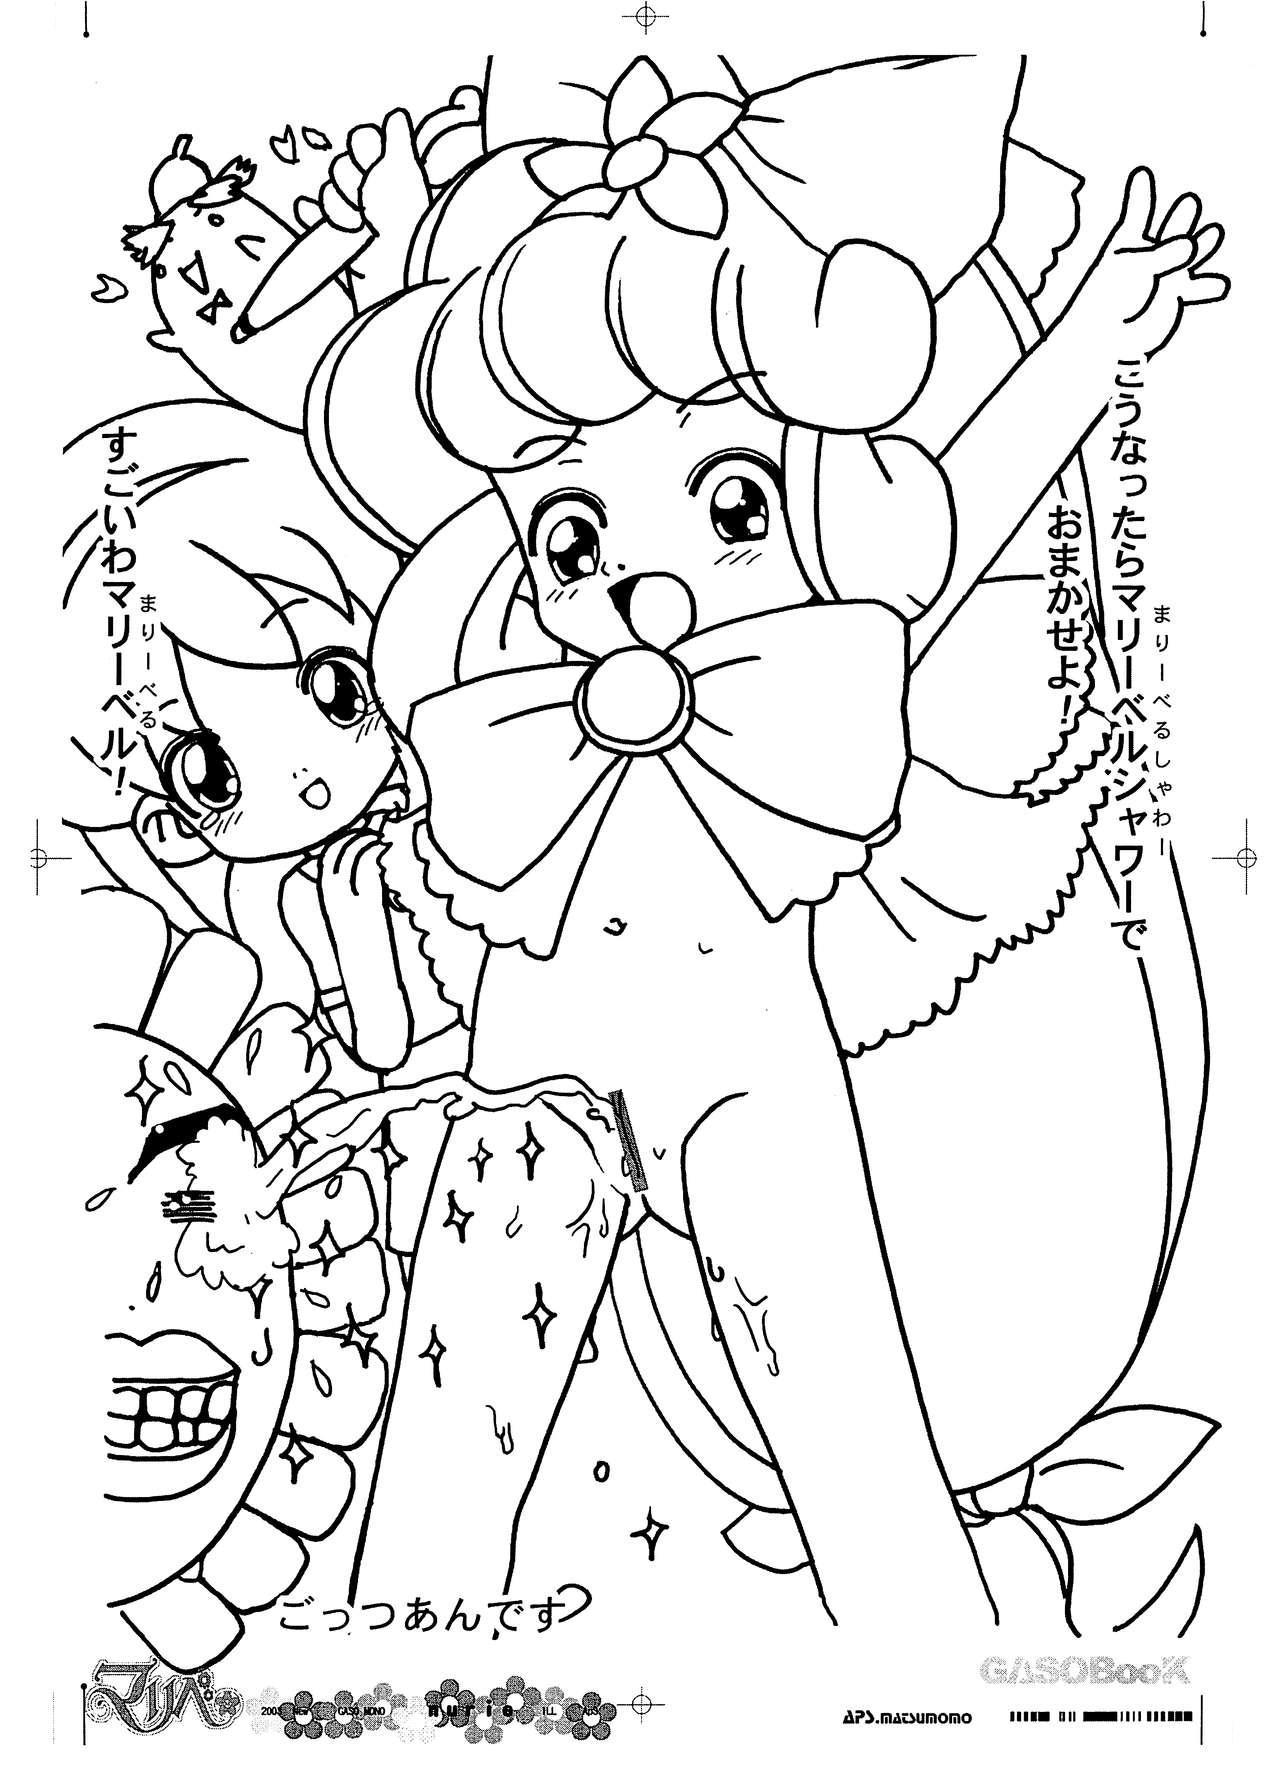 GASOBooK Genkou Youshi Ring3 Alt-0312 6